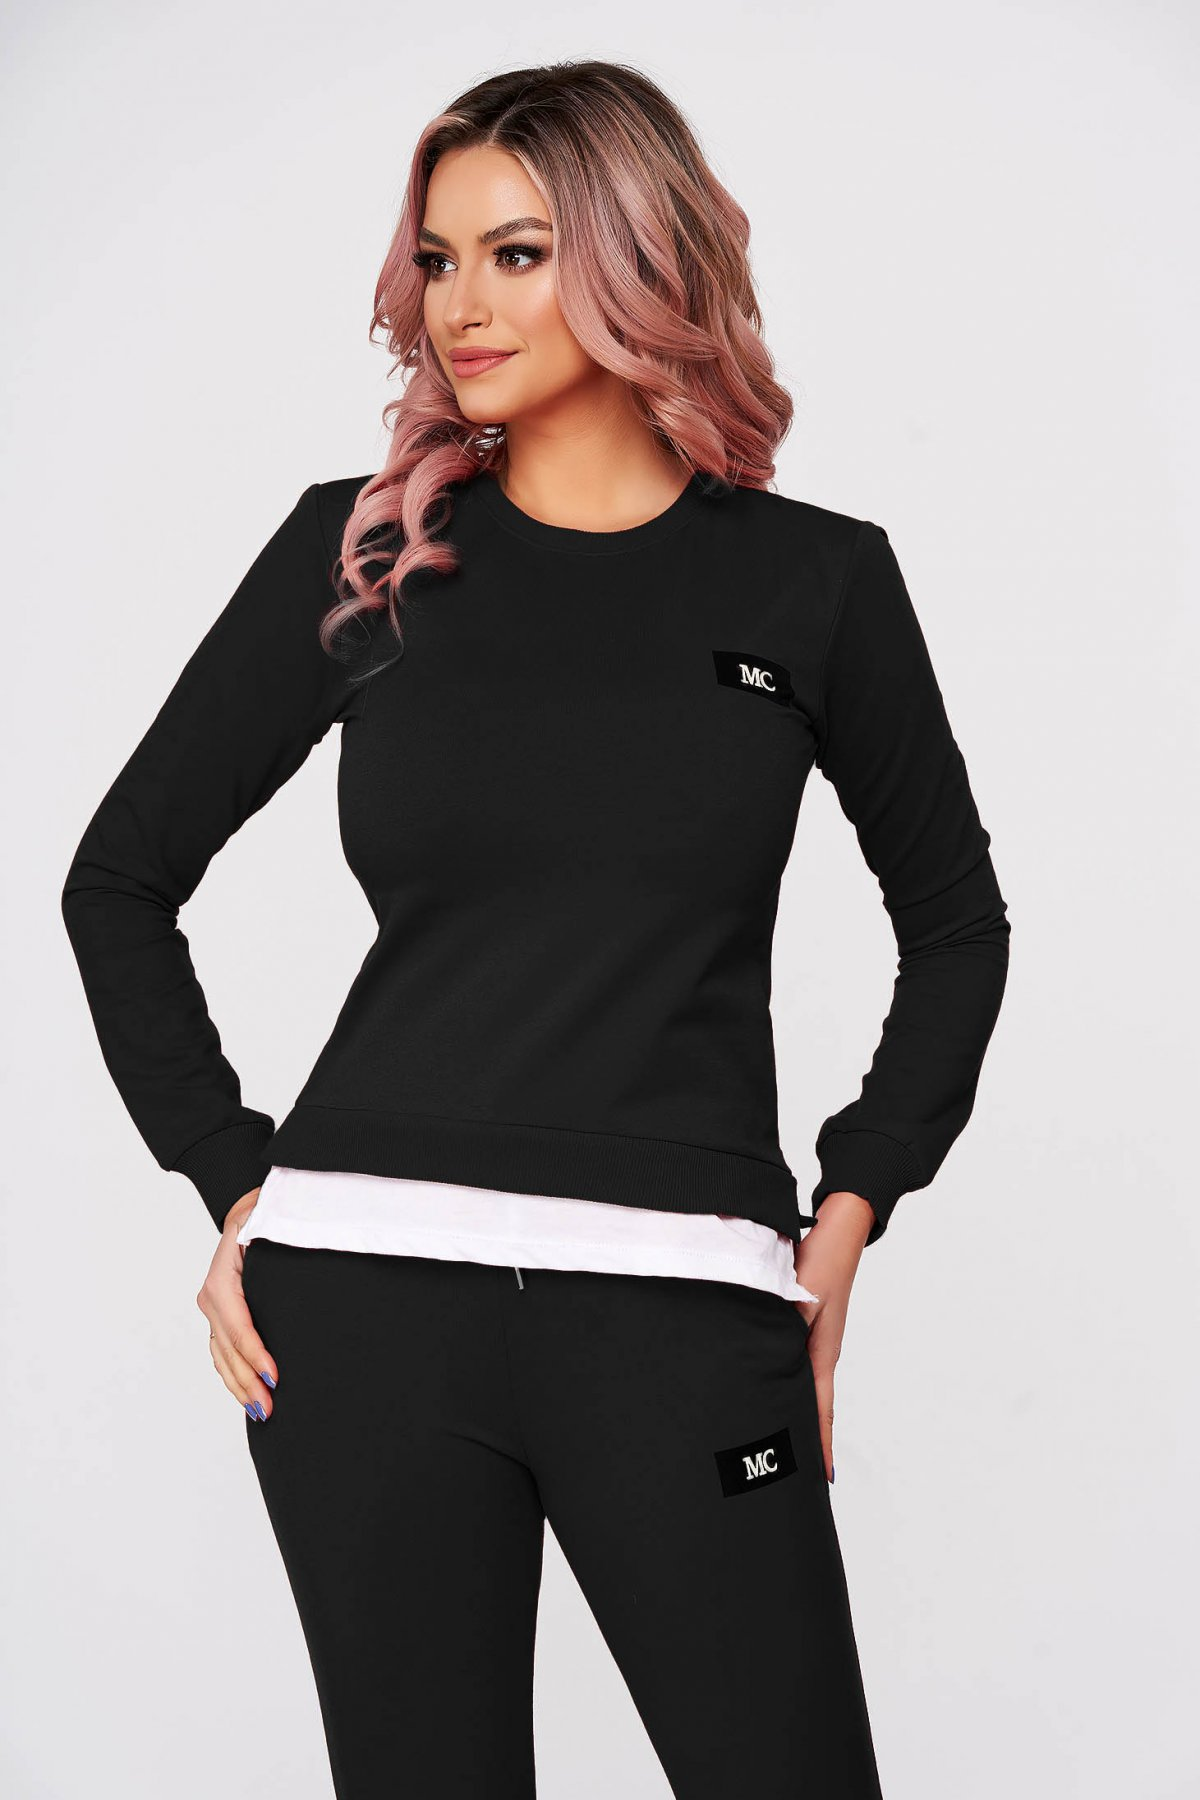 Trening dama SunShine negru din 2 piese cu pantalon din bumbac usor elastic cu croi larg si slit lateral